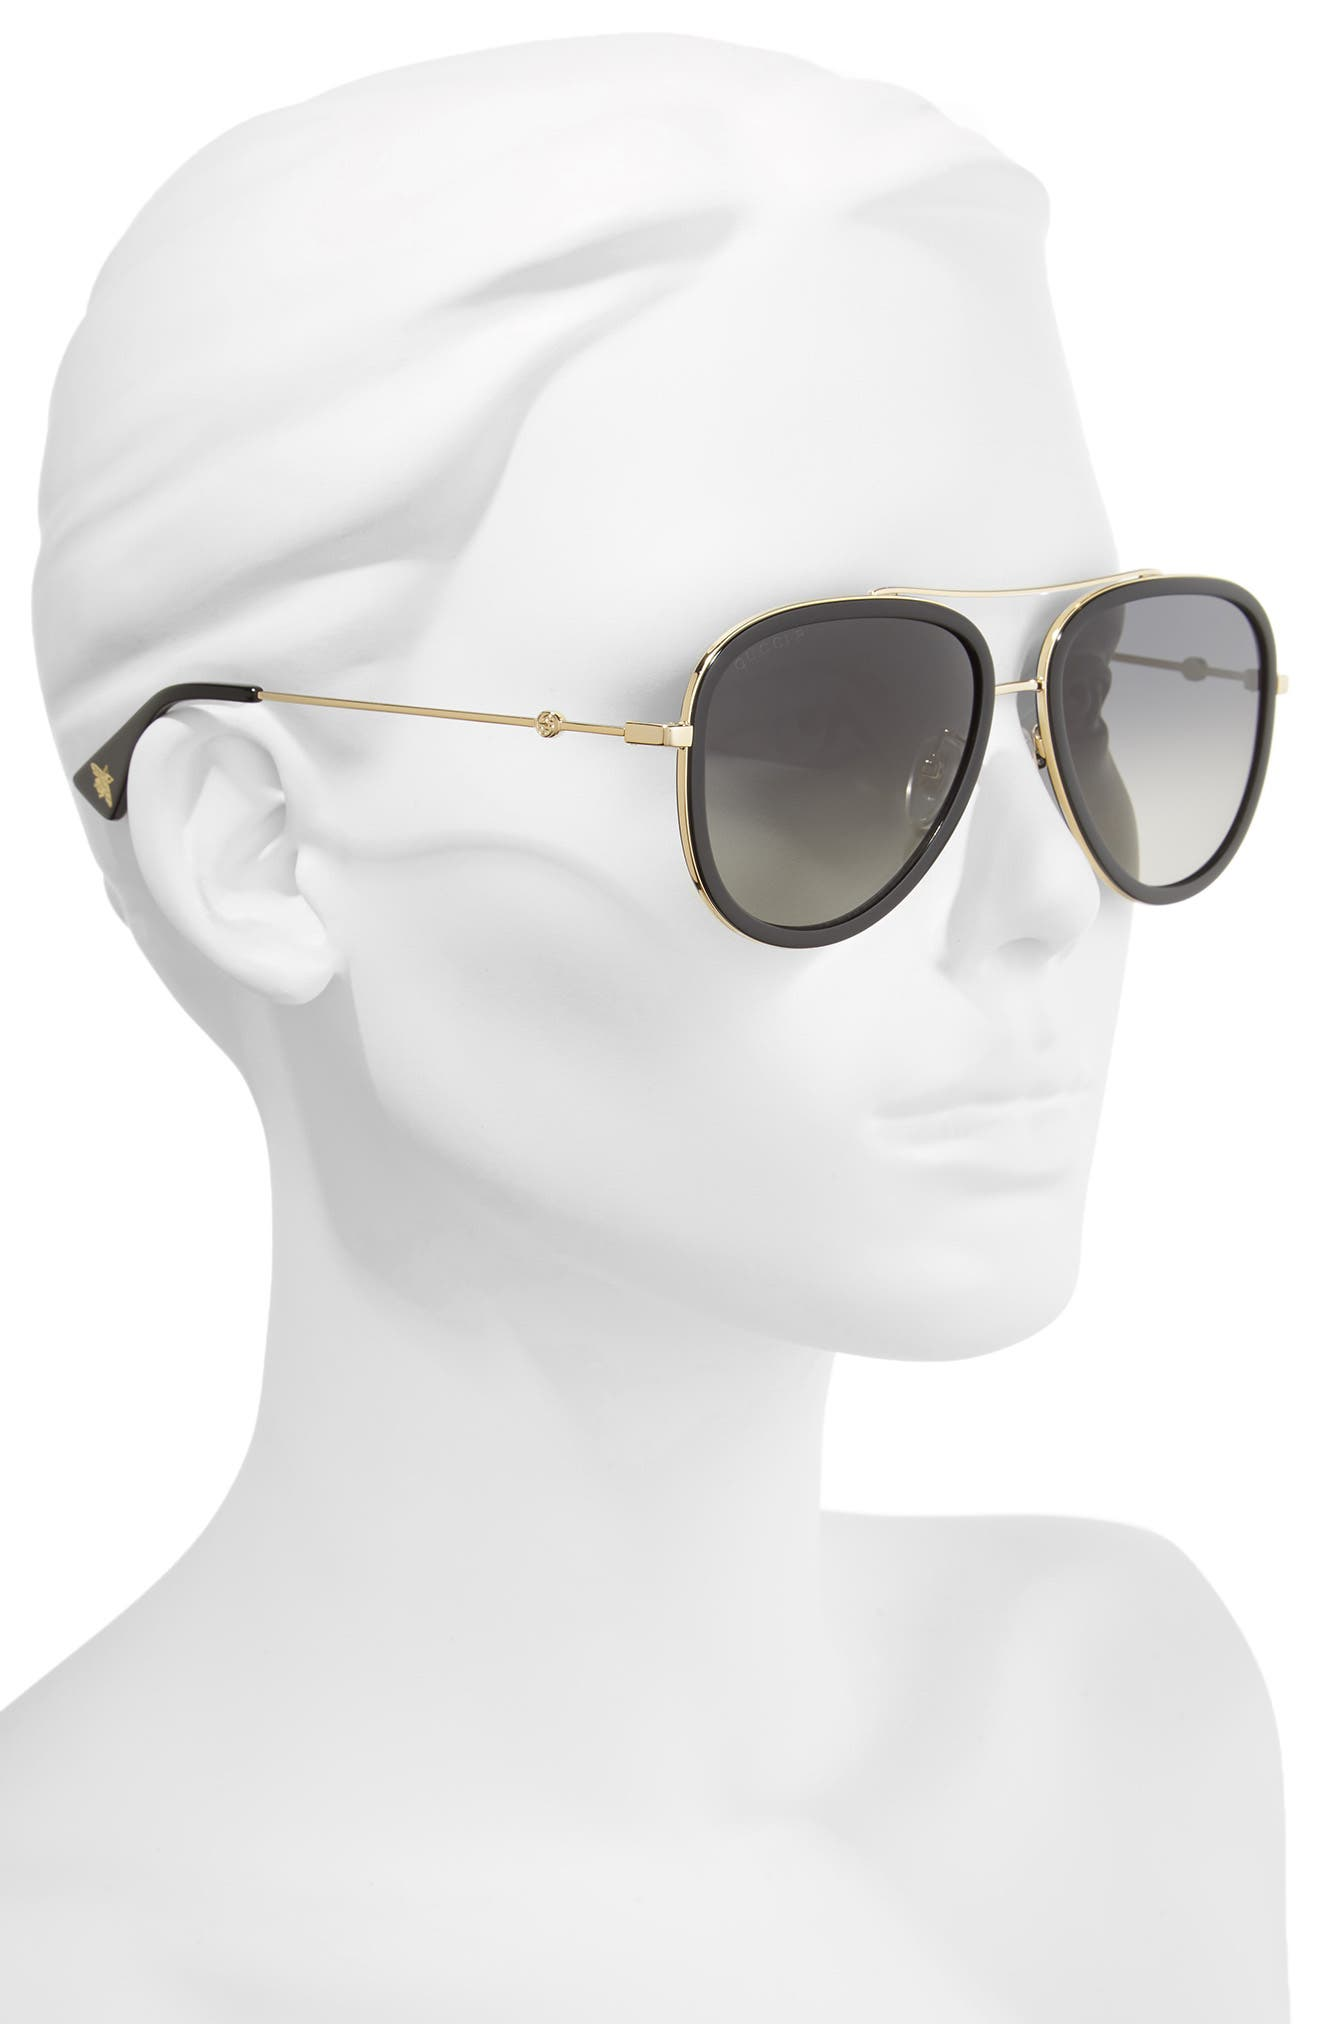 GUCCI, 57mm Polarized Metal Aviator Sunglasses, Alternate thumbnail 2, color, 710